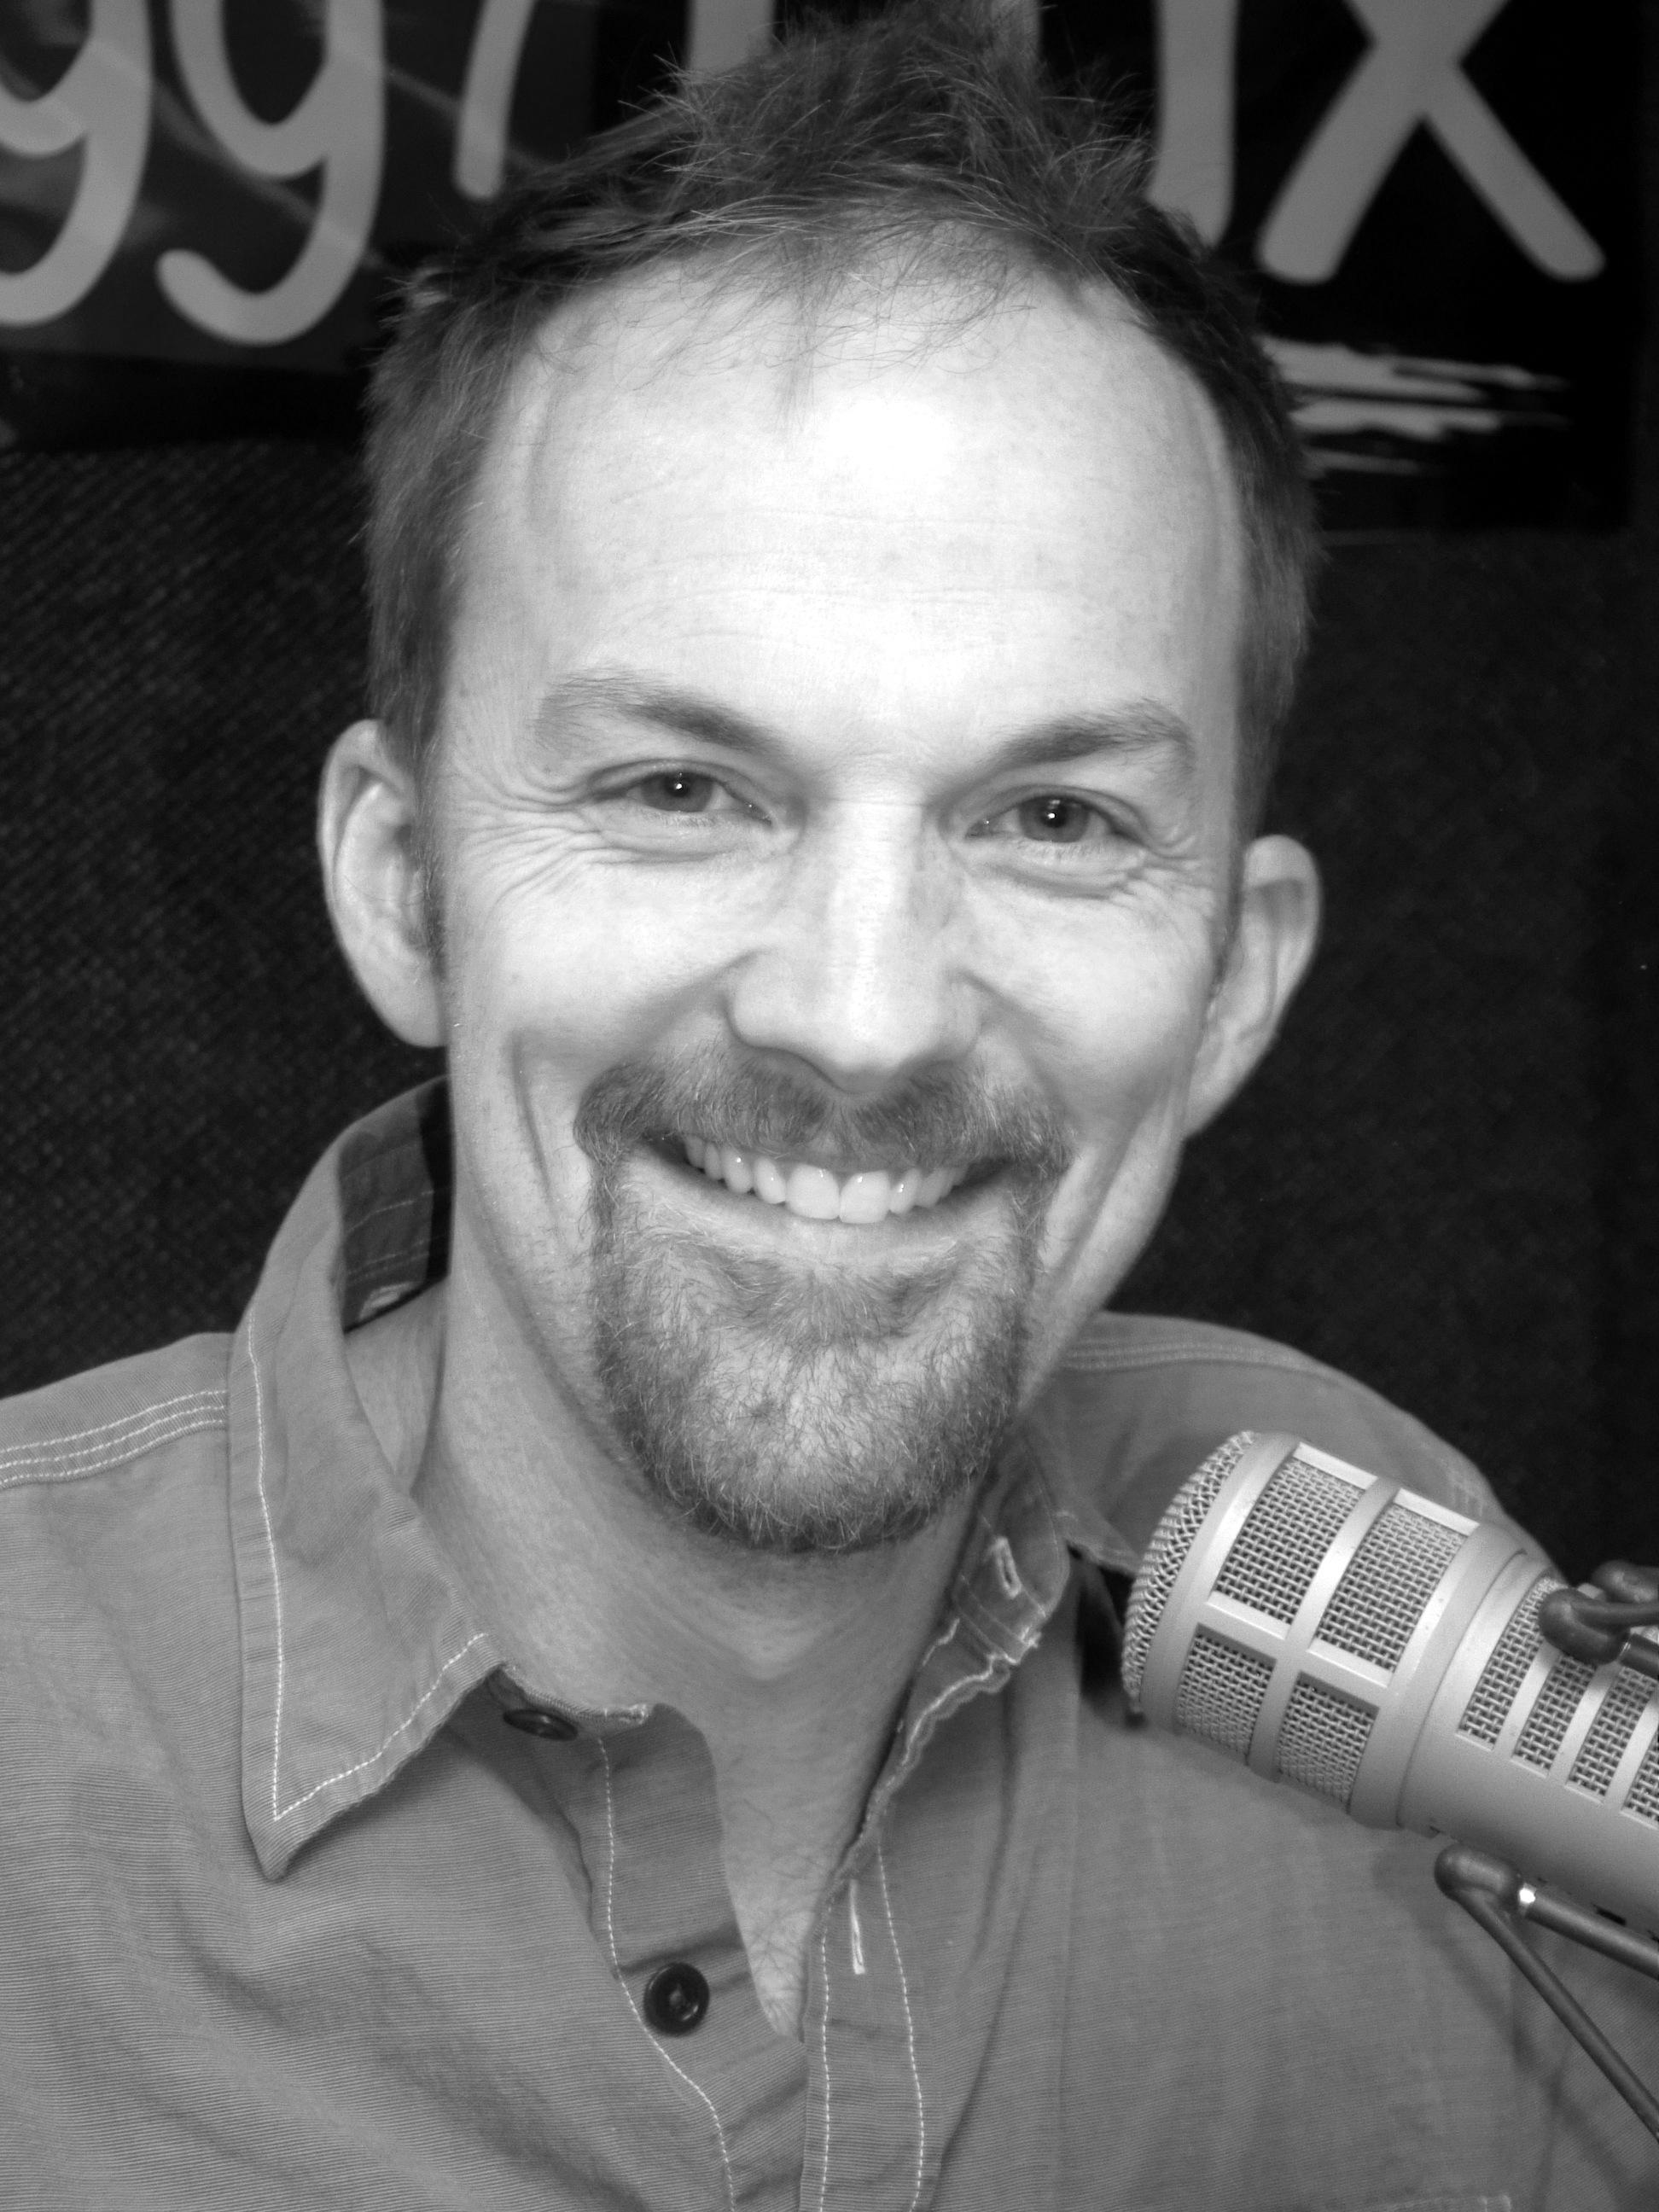 Ben Davis Headshot.JPG